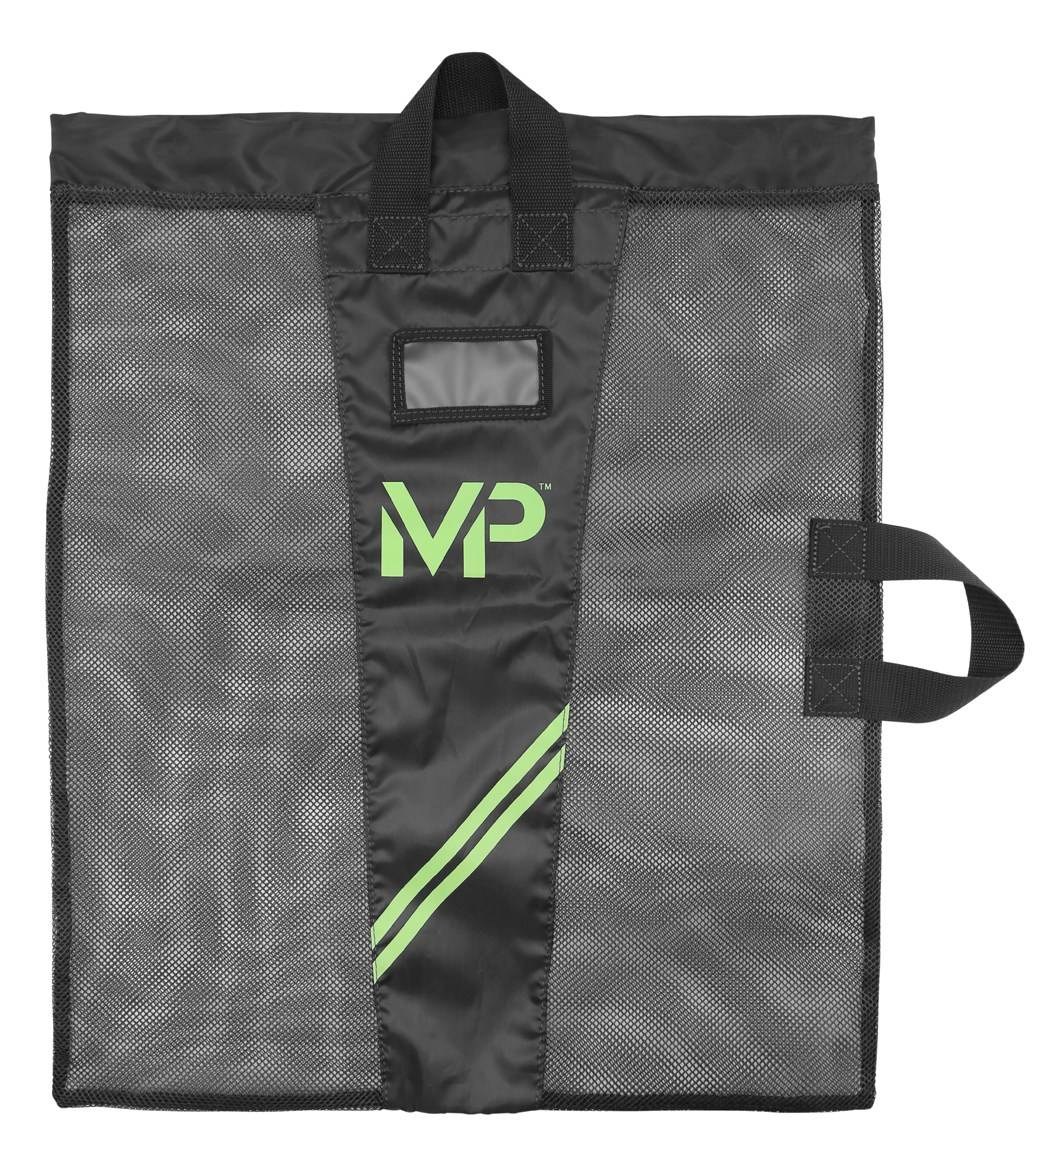 2dd5ebf19f MP Michael Phelps Mesh Gear Swim Bag at SwimOutlet.com